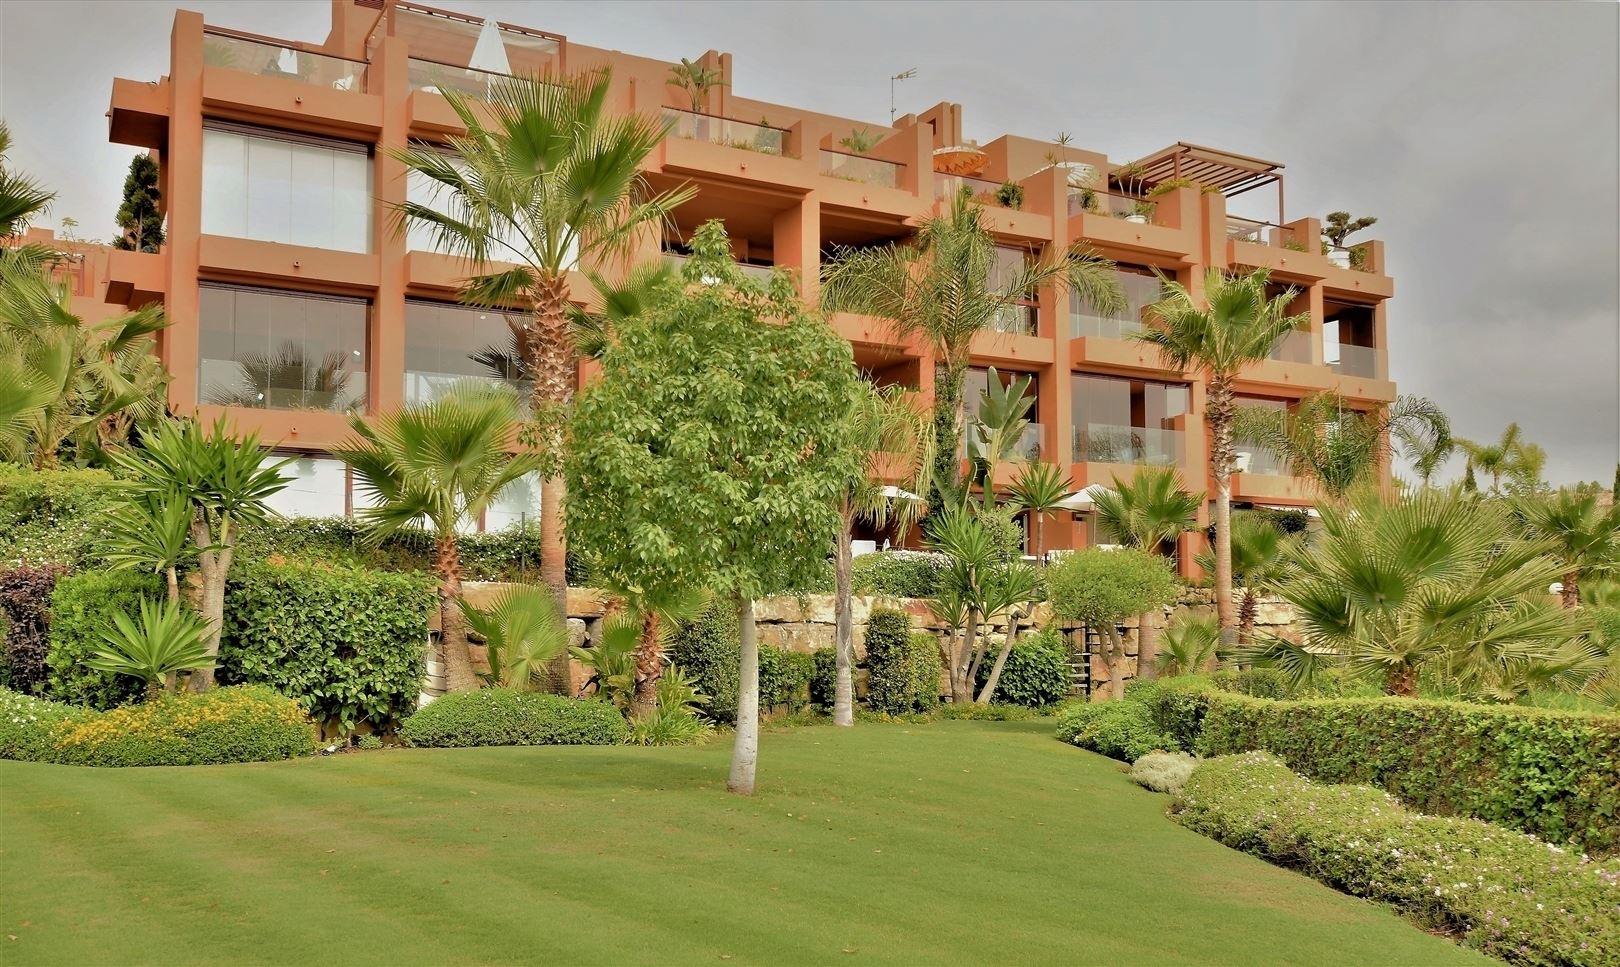 Foto 3 : Appartement te 29679 MARBELLA (Spanje) - Prijs € 1.750